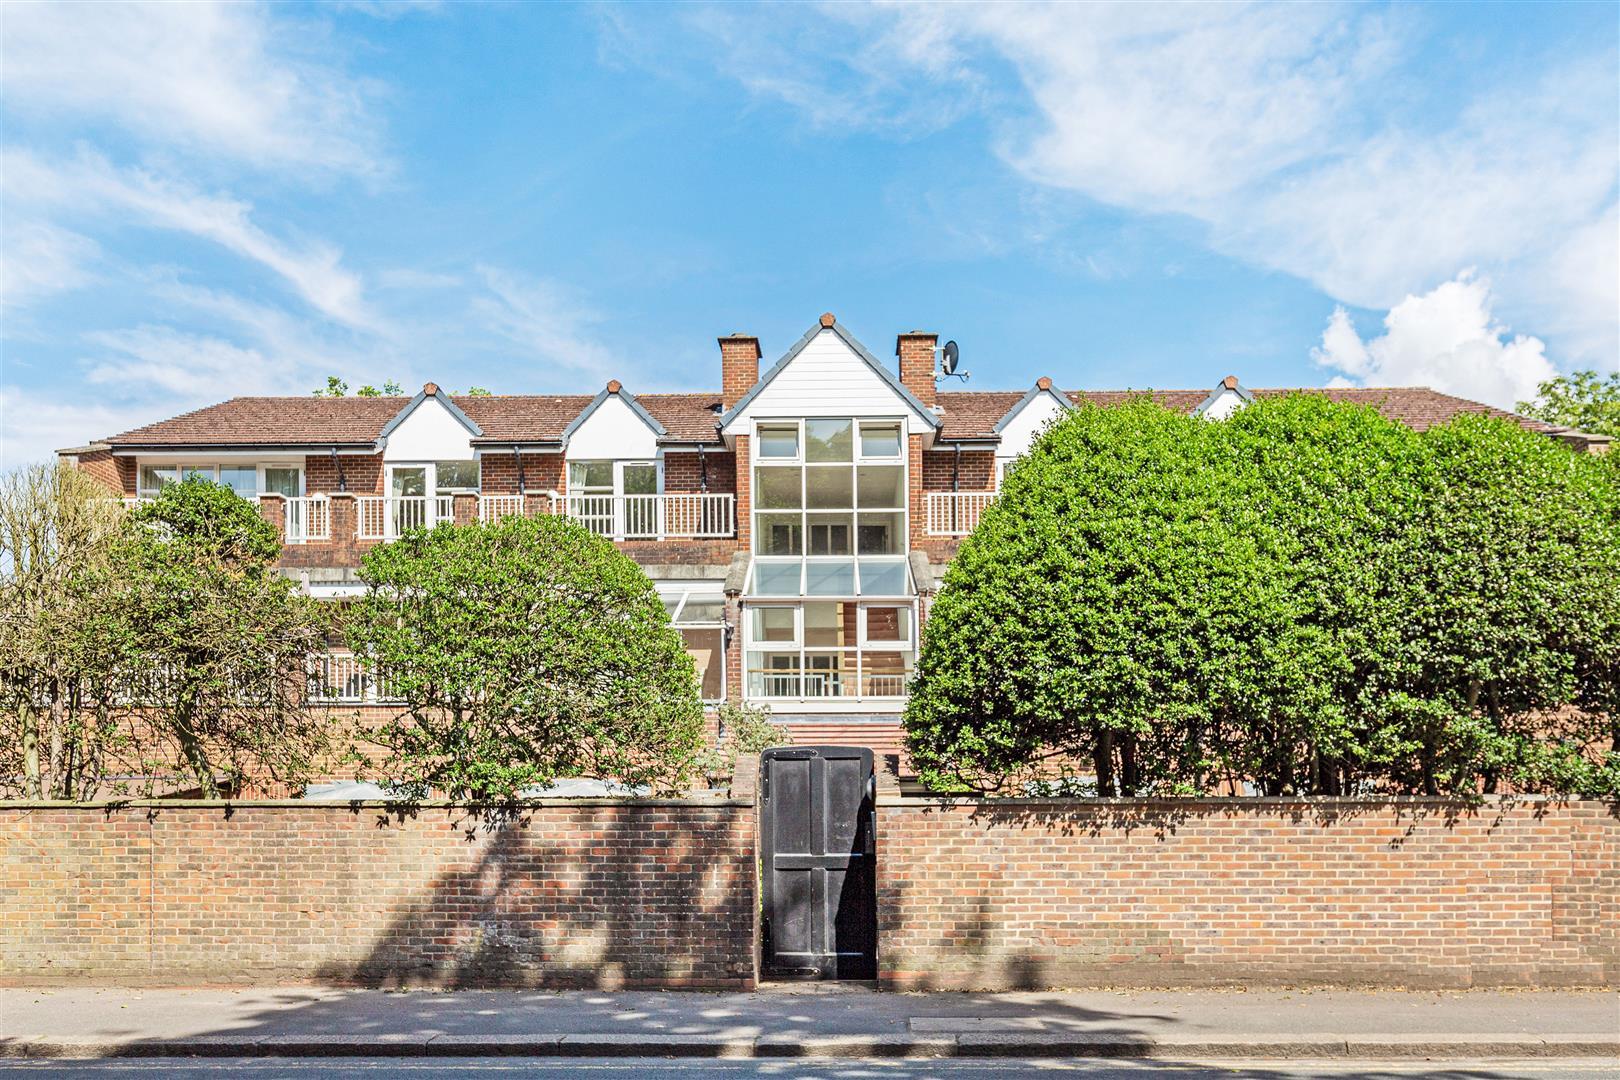 Somerset Road, Wimbledon - Andrew Scott Robertson